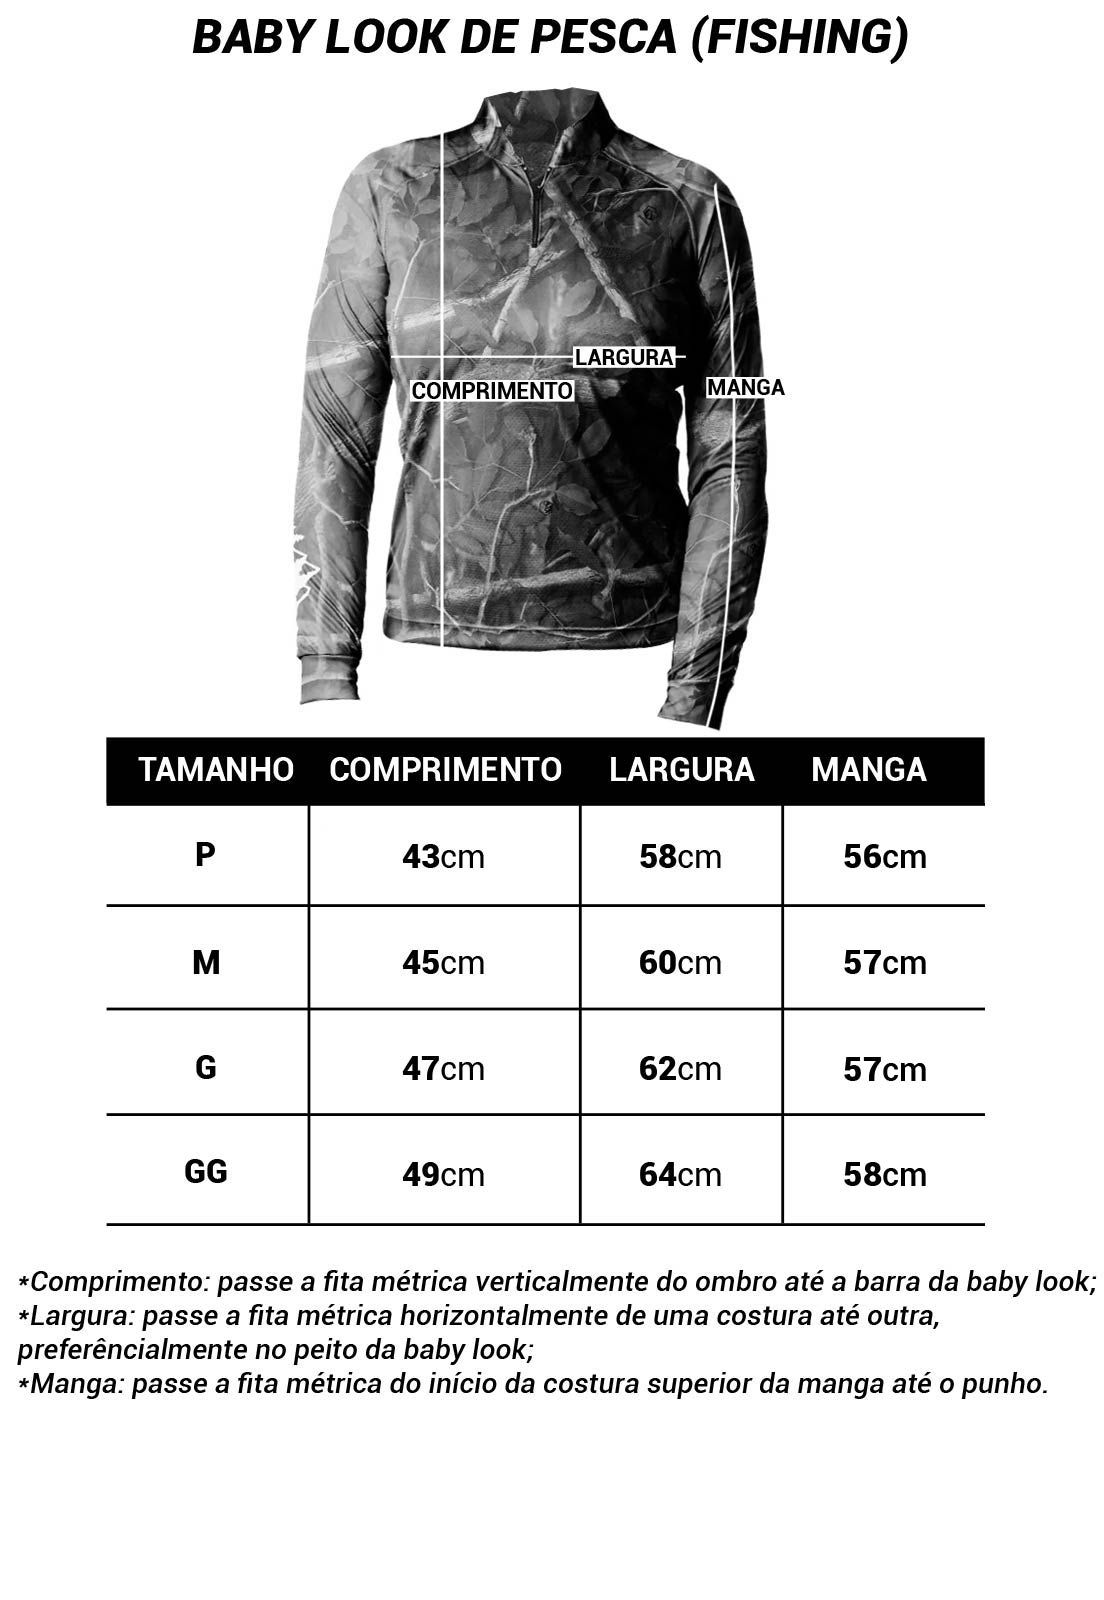 CAMISA DE PESCA FISH TECH PRO 28 FEMININA + BANDANA GRÁTIS  - Real Hunter